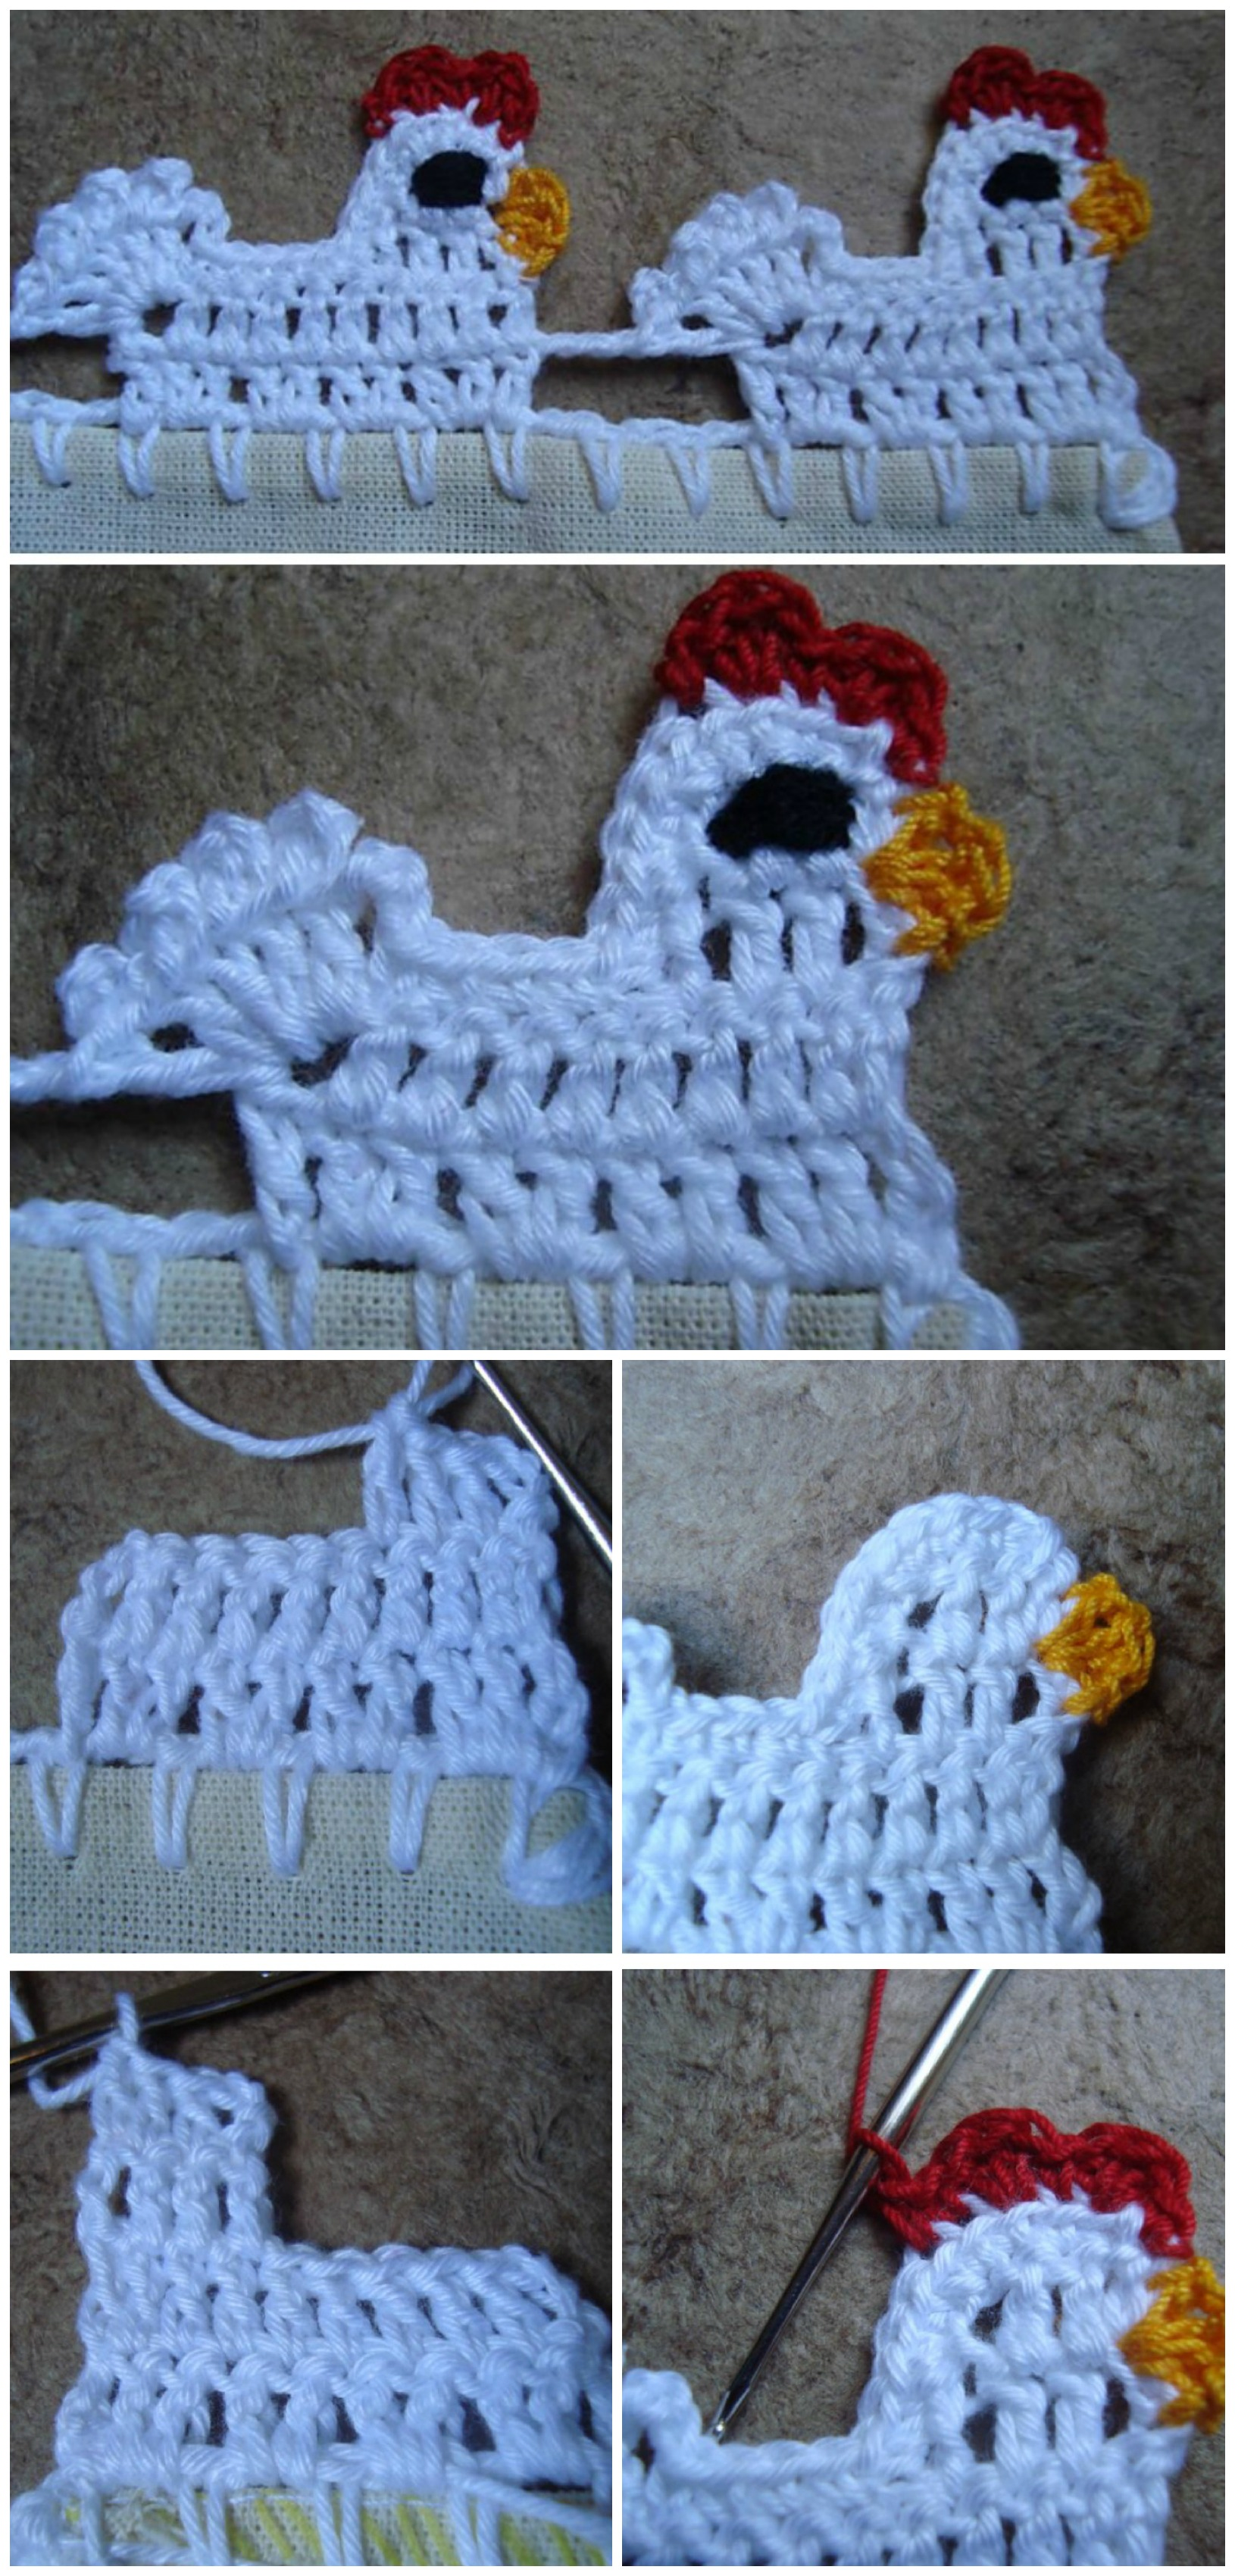 Crochet Elephant Edging - Free Tutorial | Crochet elephant ... | 3400x1630